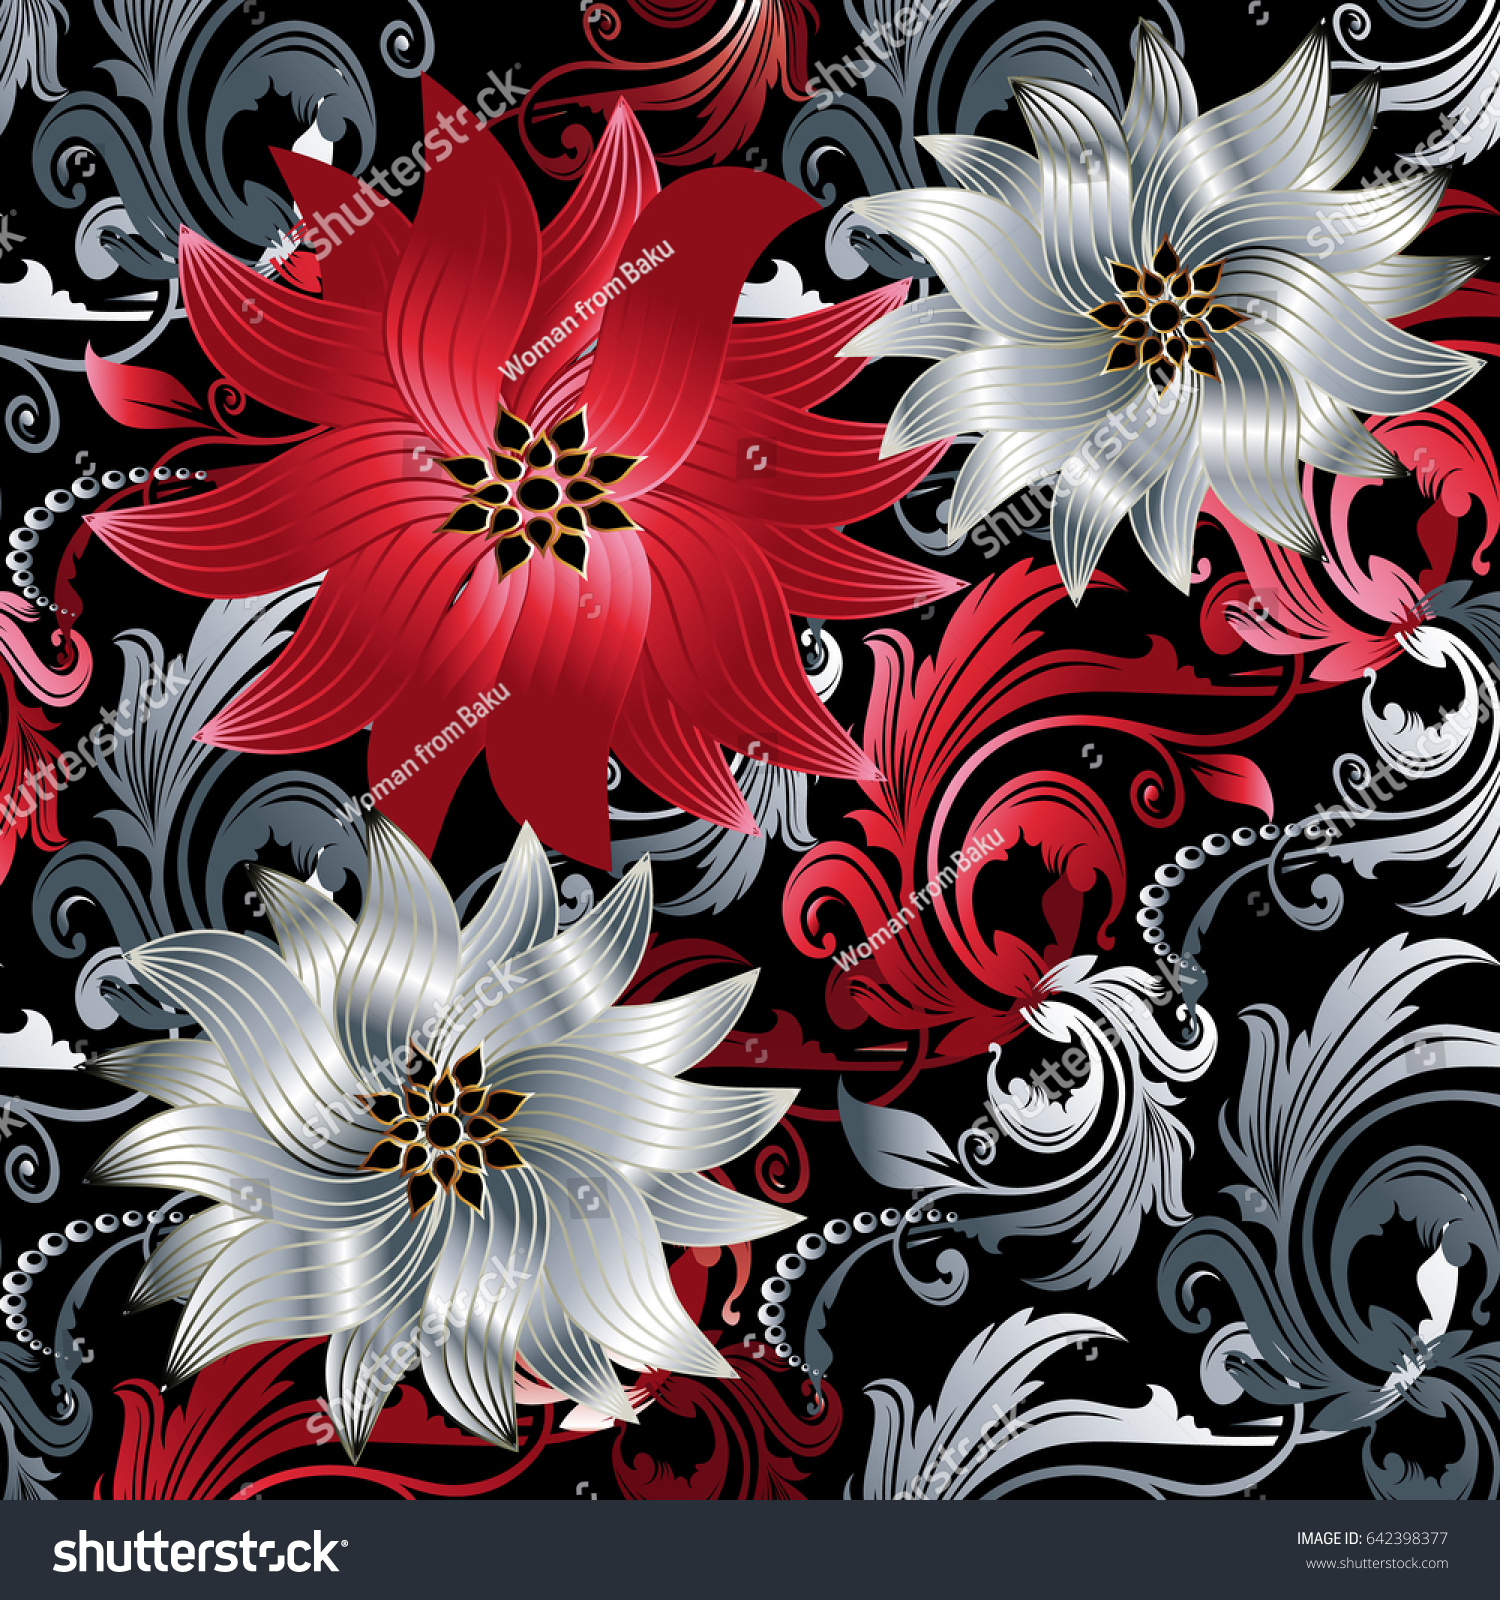 Floral Baroque Seamless Pattern Black Vector Stock Vector 642398377